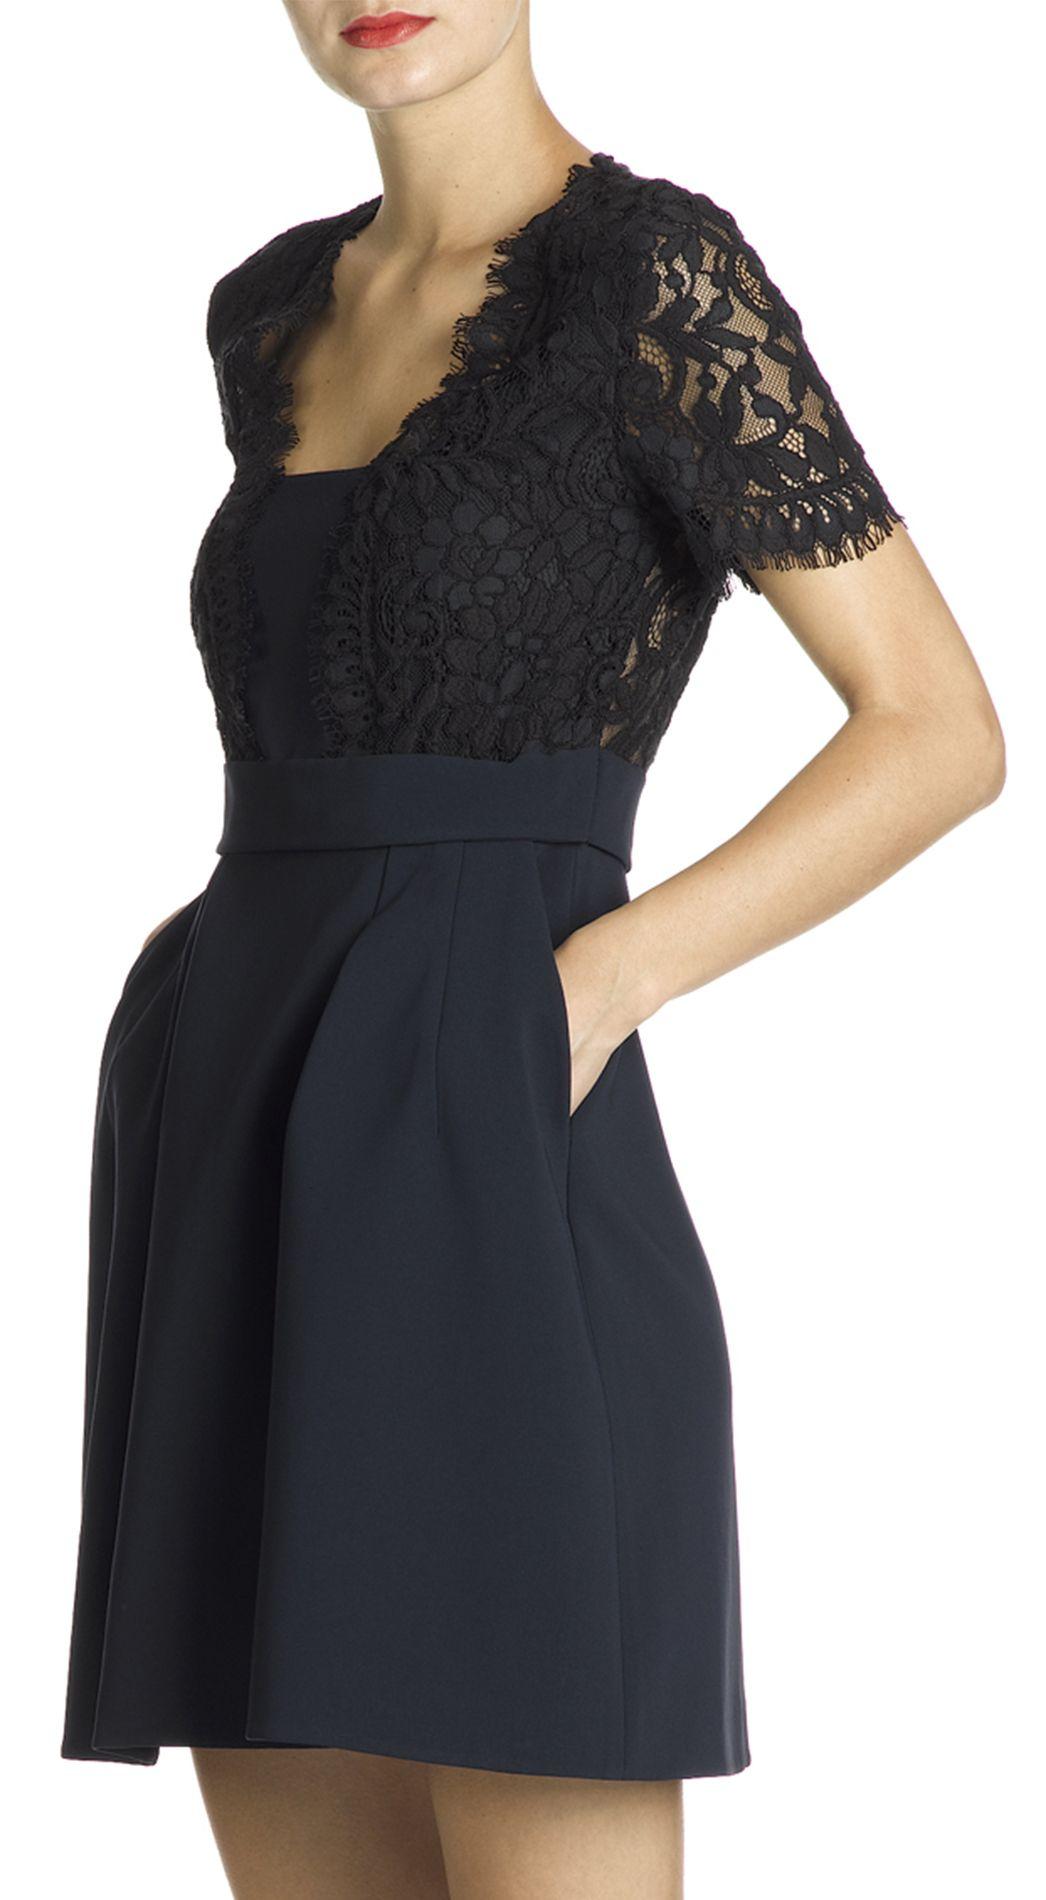 Petite robe noire claudie pierlot